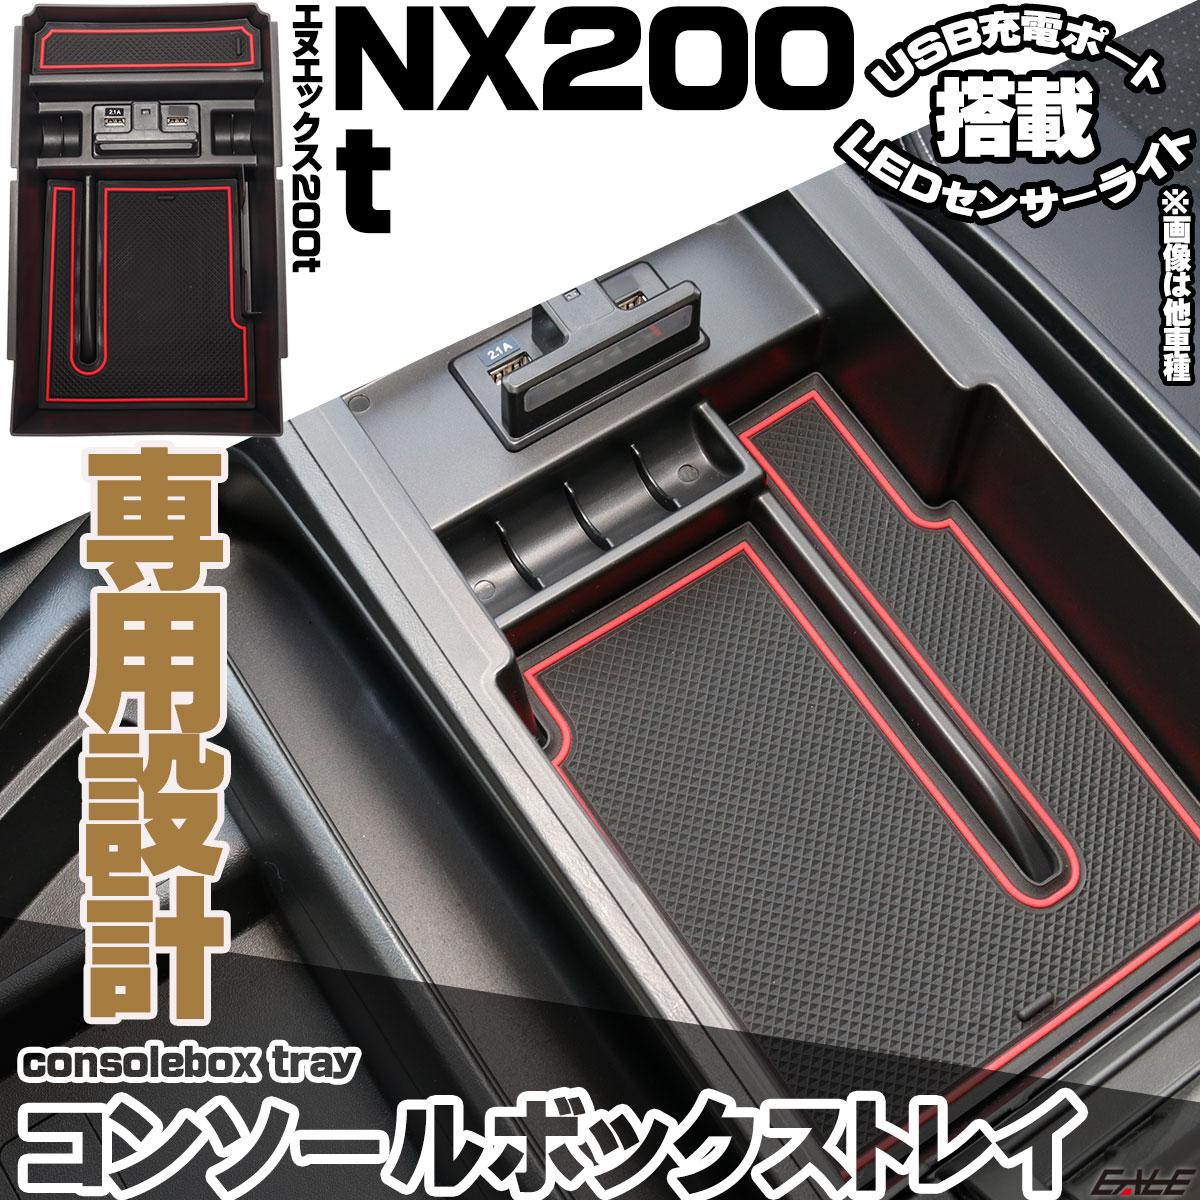 NX200t 専用設計 センター コンソール ボックス トレイ USB 2ポート 急速充電 QC3.0対応 LED センサーライト 搭載 S-890